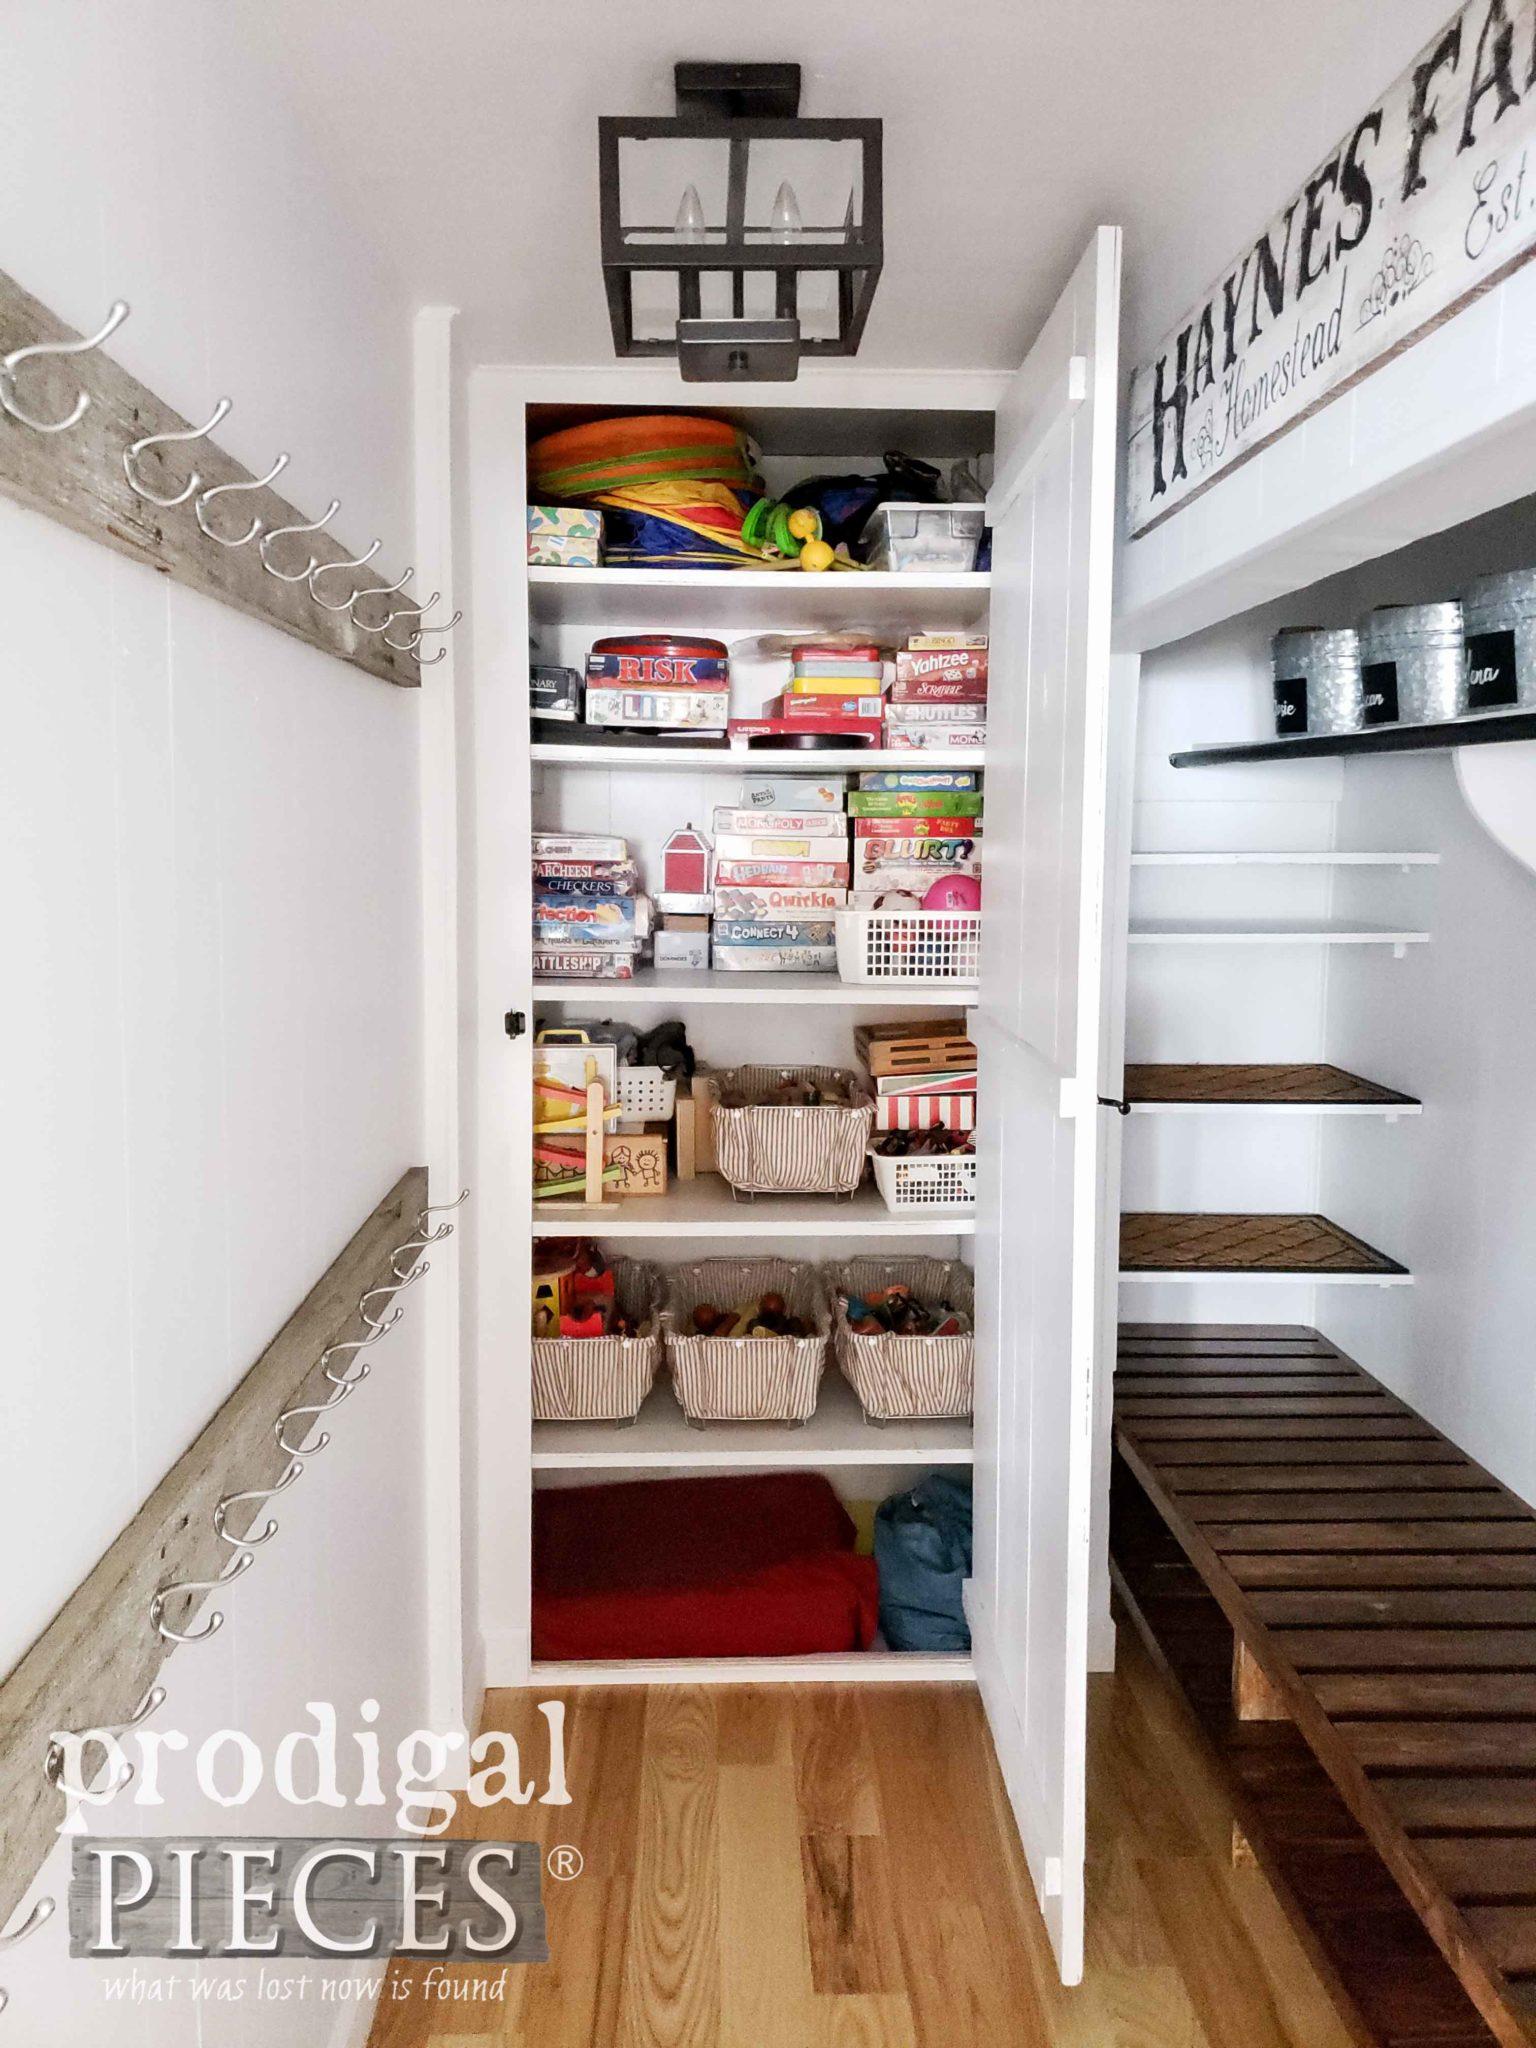 DIY Farmhouse Style Mudroom with Built-In Game Closet by Prodigal Pieces | prodigalpieces.com #prodigalpieces #diy #home #homeimprovement #homedecor #farmhouse